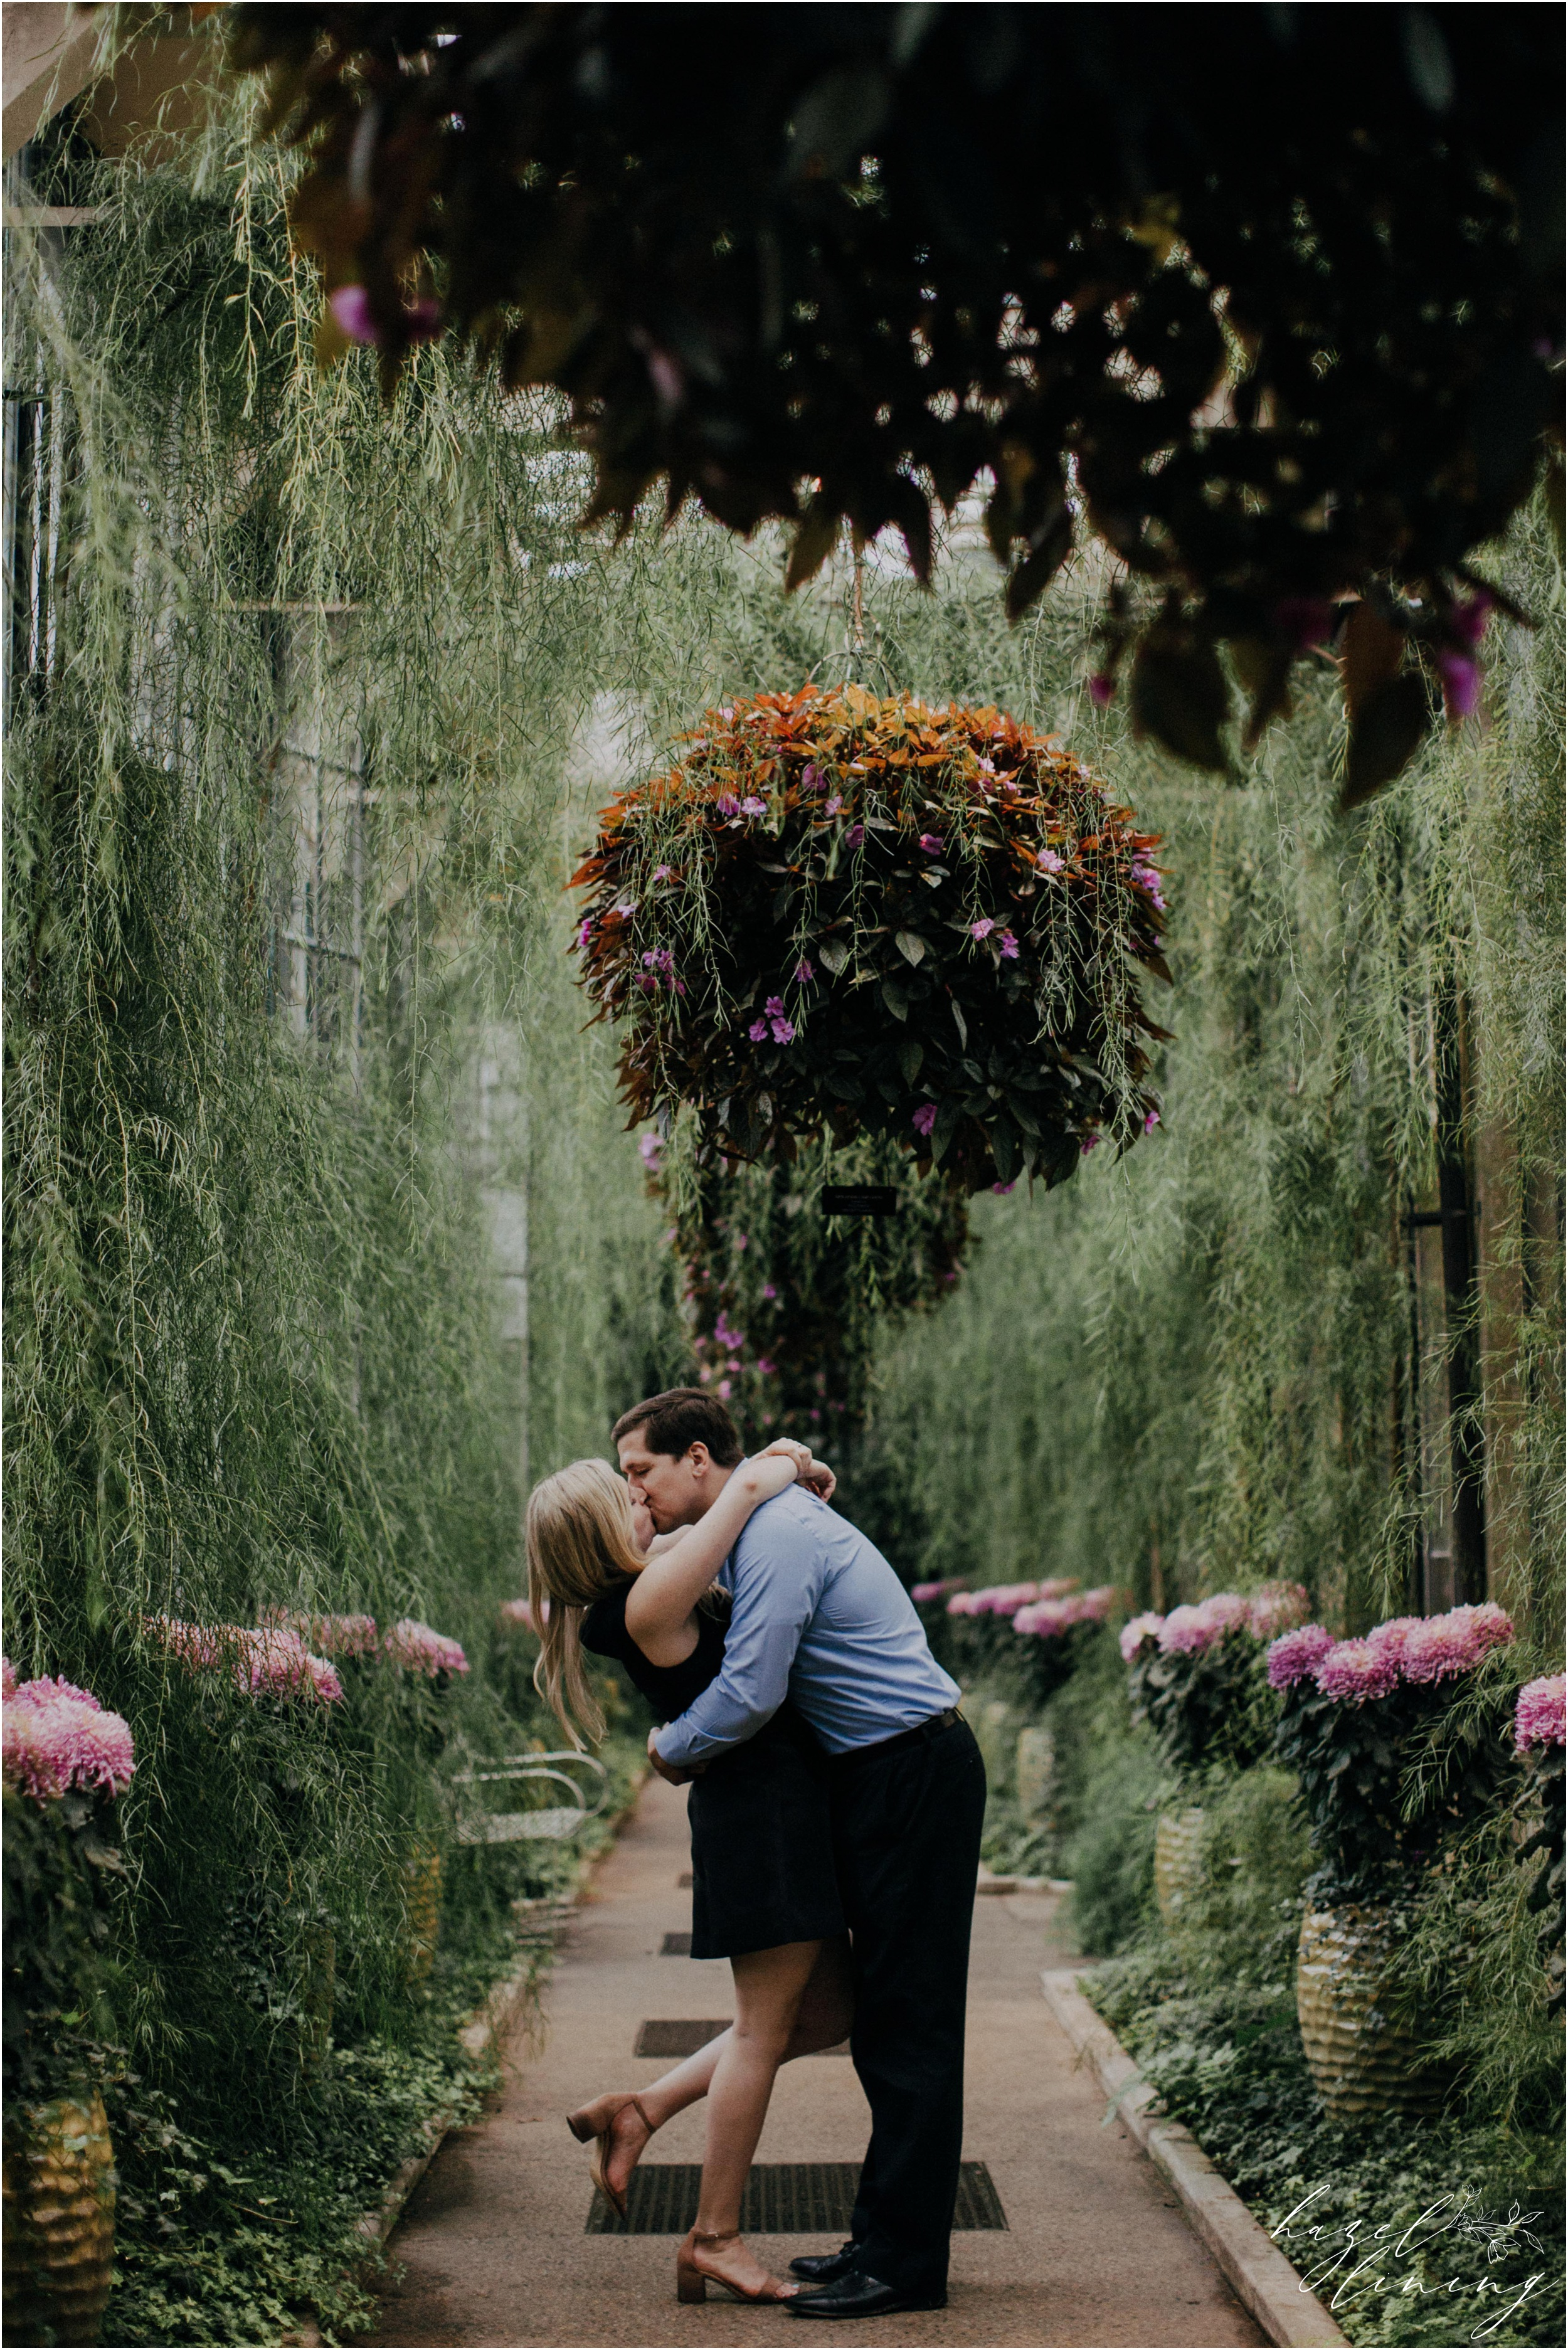 victoria-travis-logan-mayes-longwood-gardens-kennett-square-philadelphia-engagement-session-hazel-lining-photography-destination-elopement-wedding-engagement-photography_0048.jpg